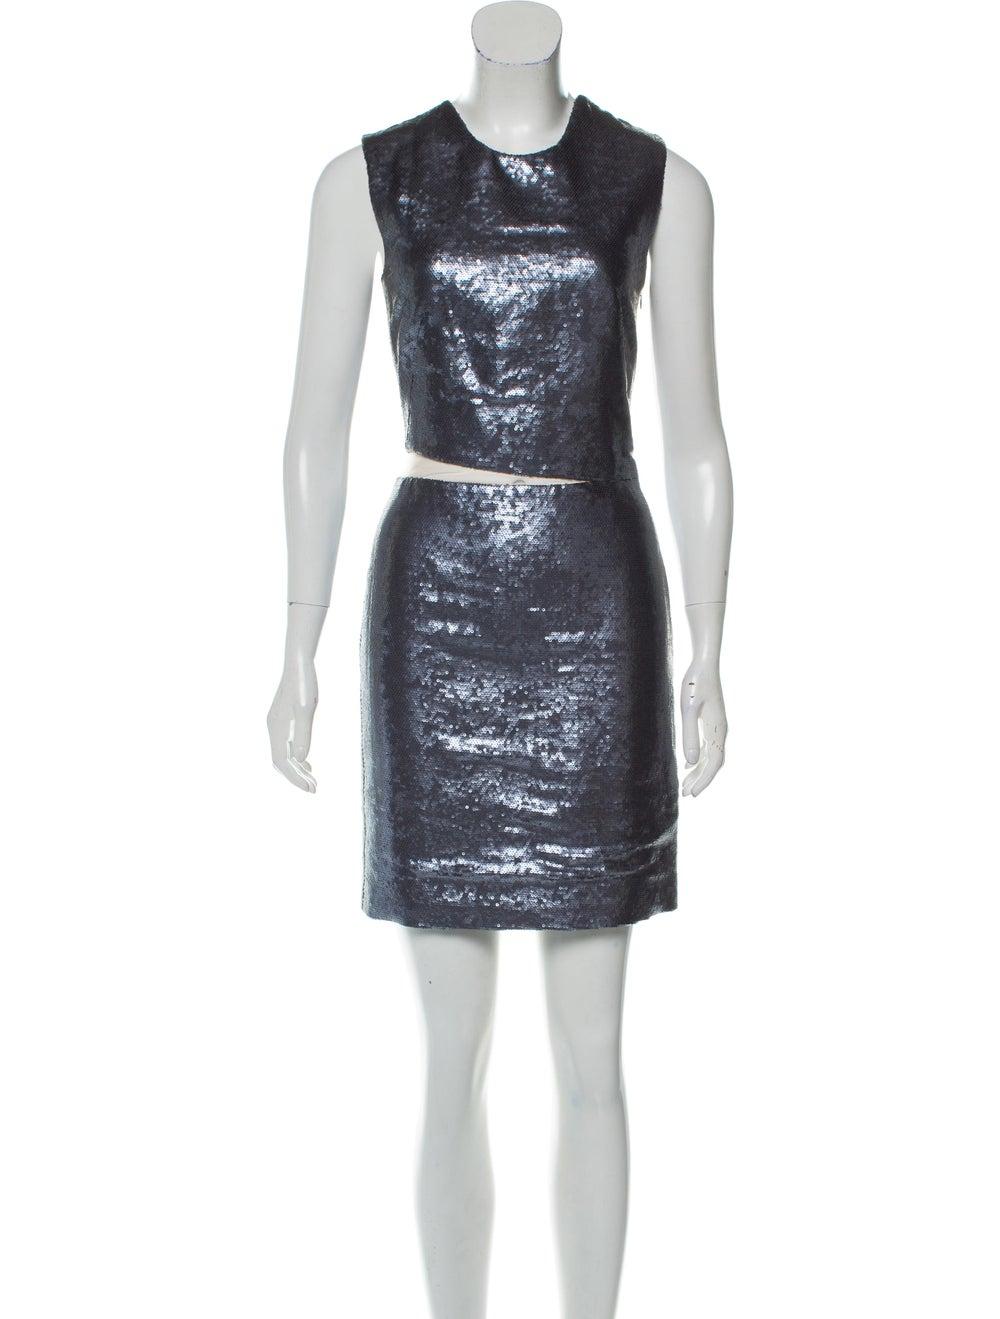 Kaufmanfranco Mesh-Trimmed Sequin Dress - image 1